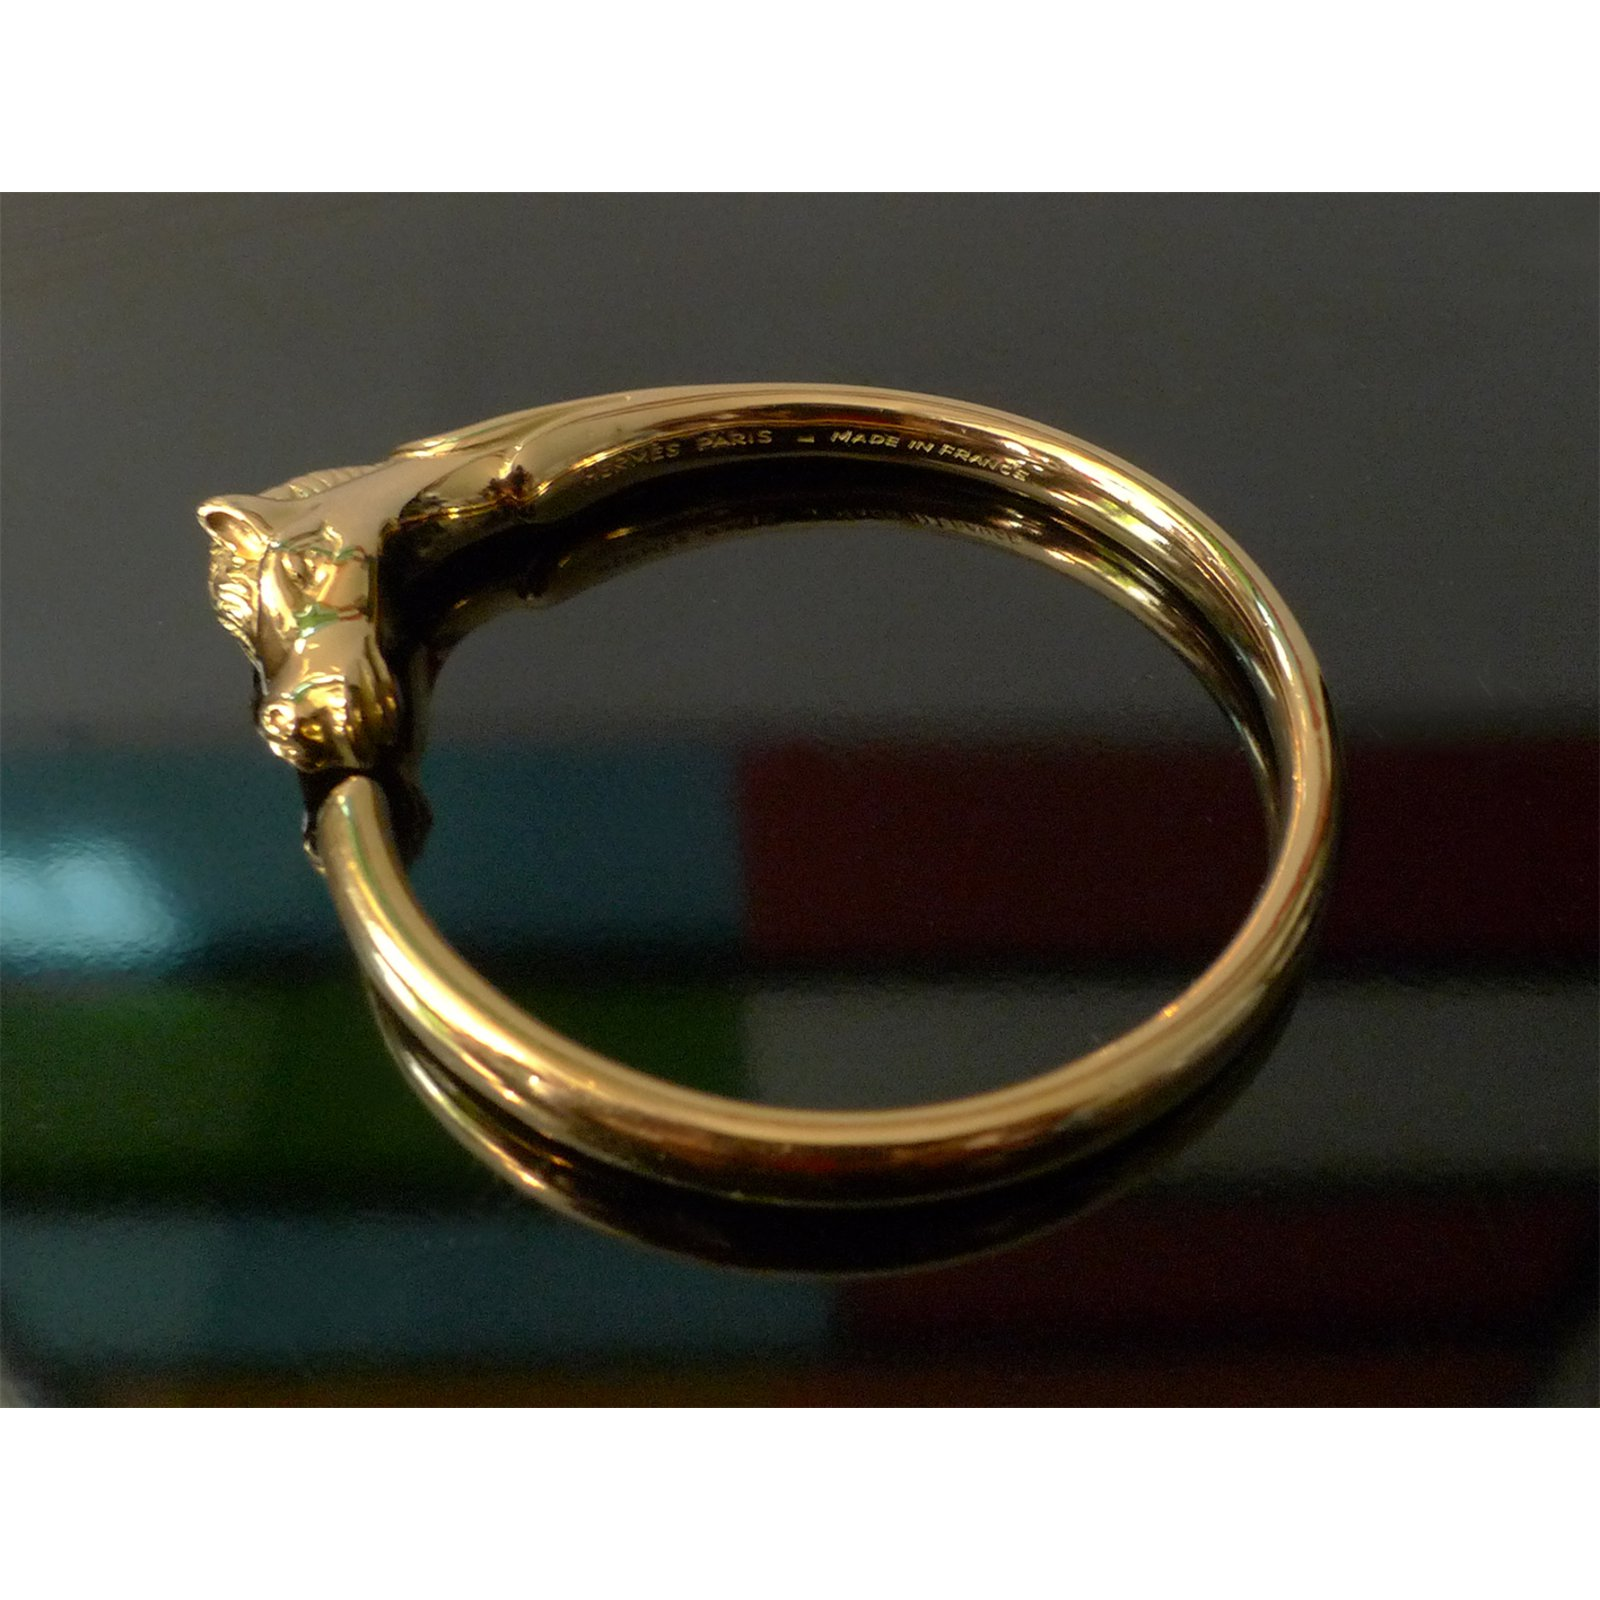 80b47520c8bb Hermès Bracelet Hermès tête de cheval Bracelets Gold-plated Golden  ref.20277 - Joli Closet